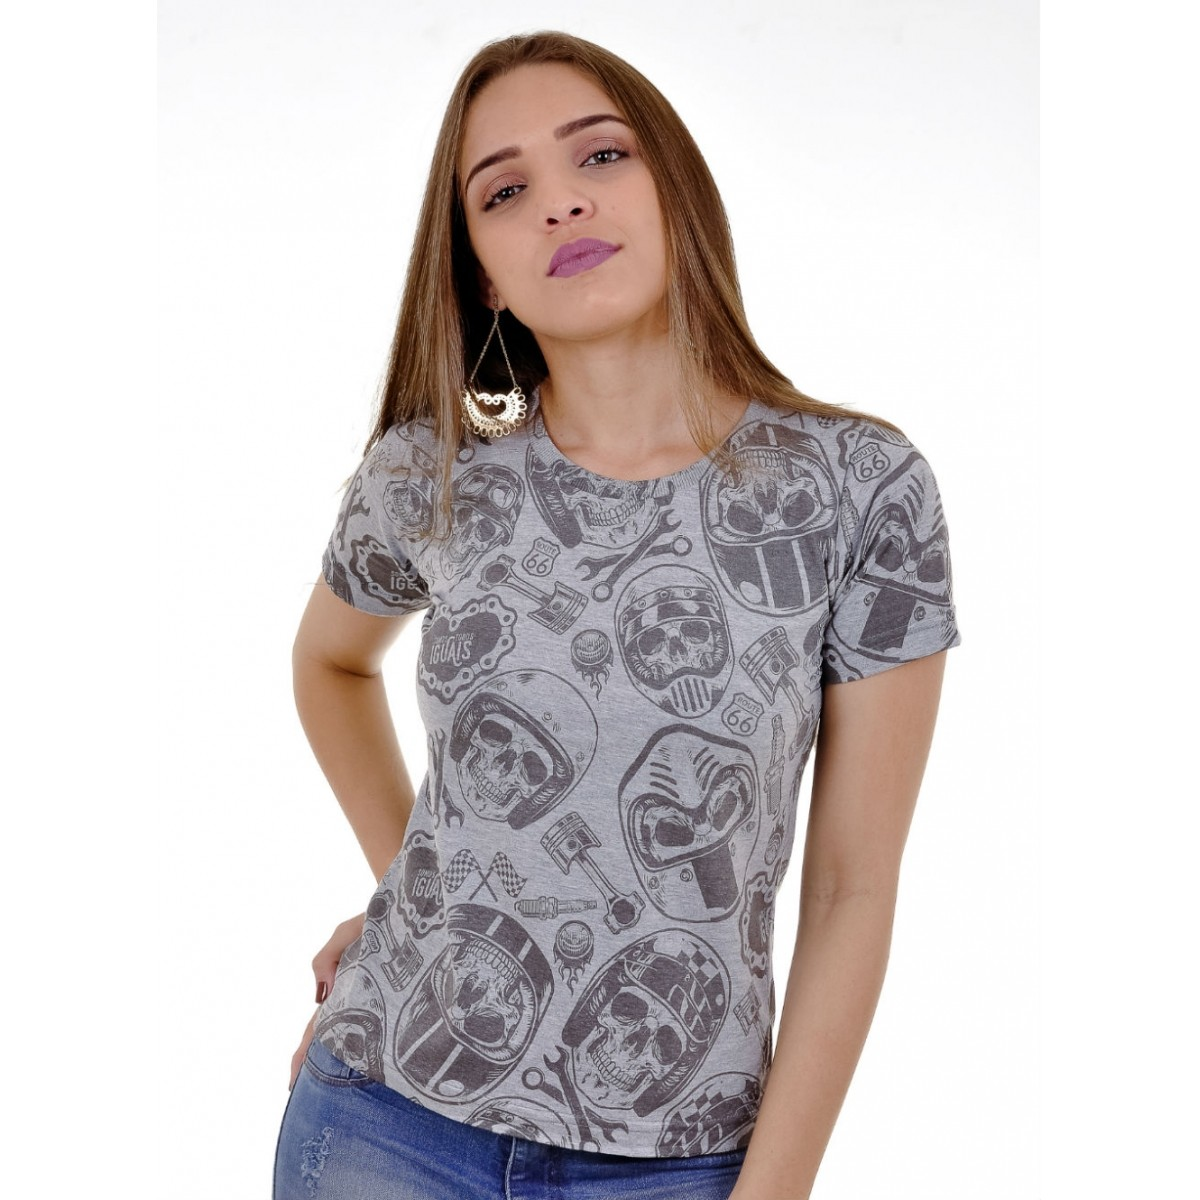 Camiseta Feminina Somos Todos Iguais